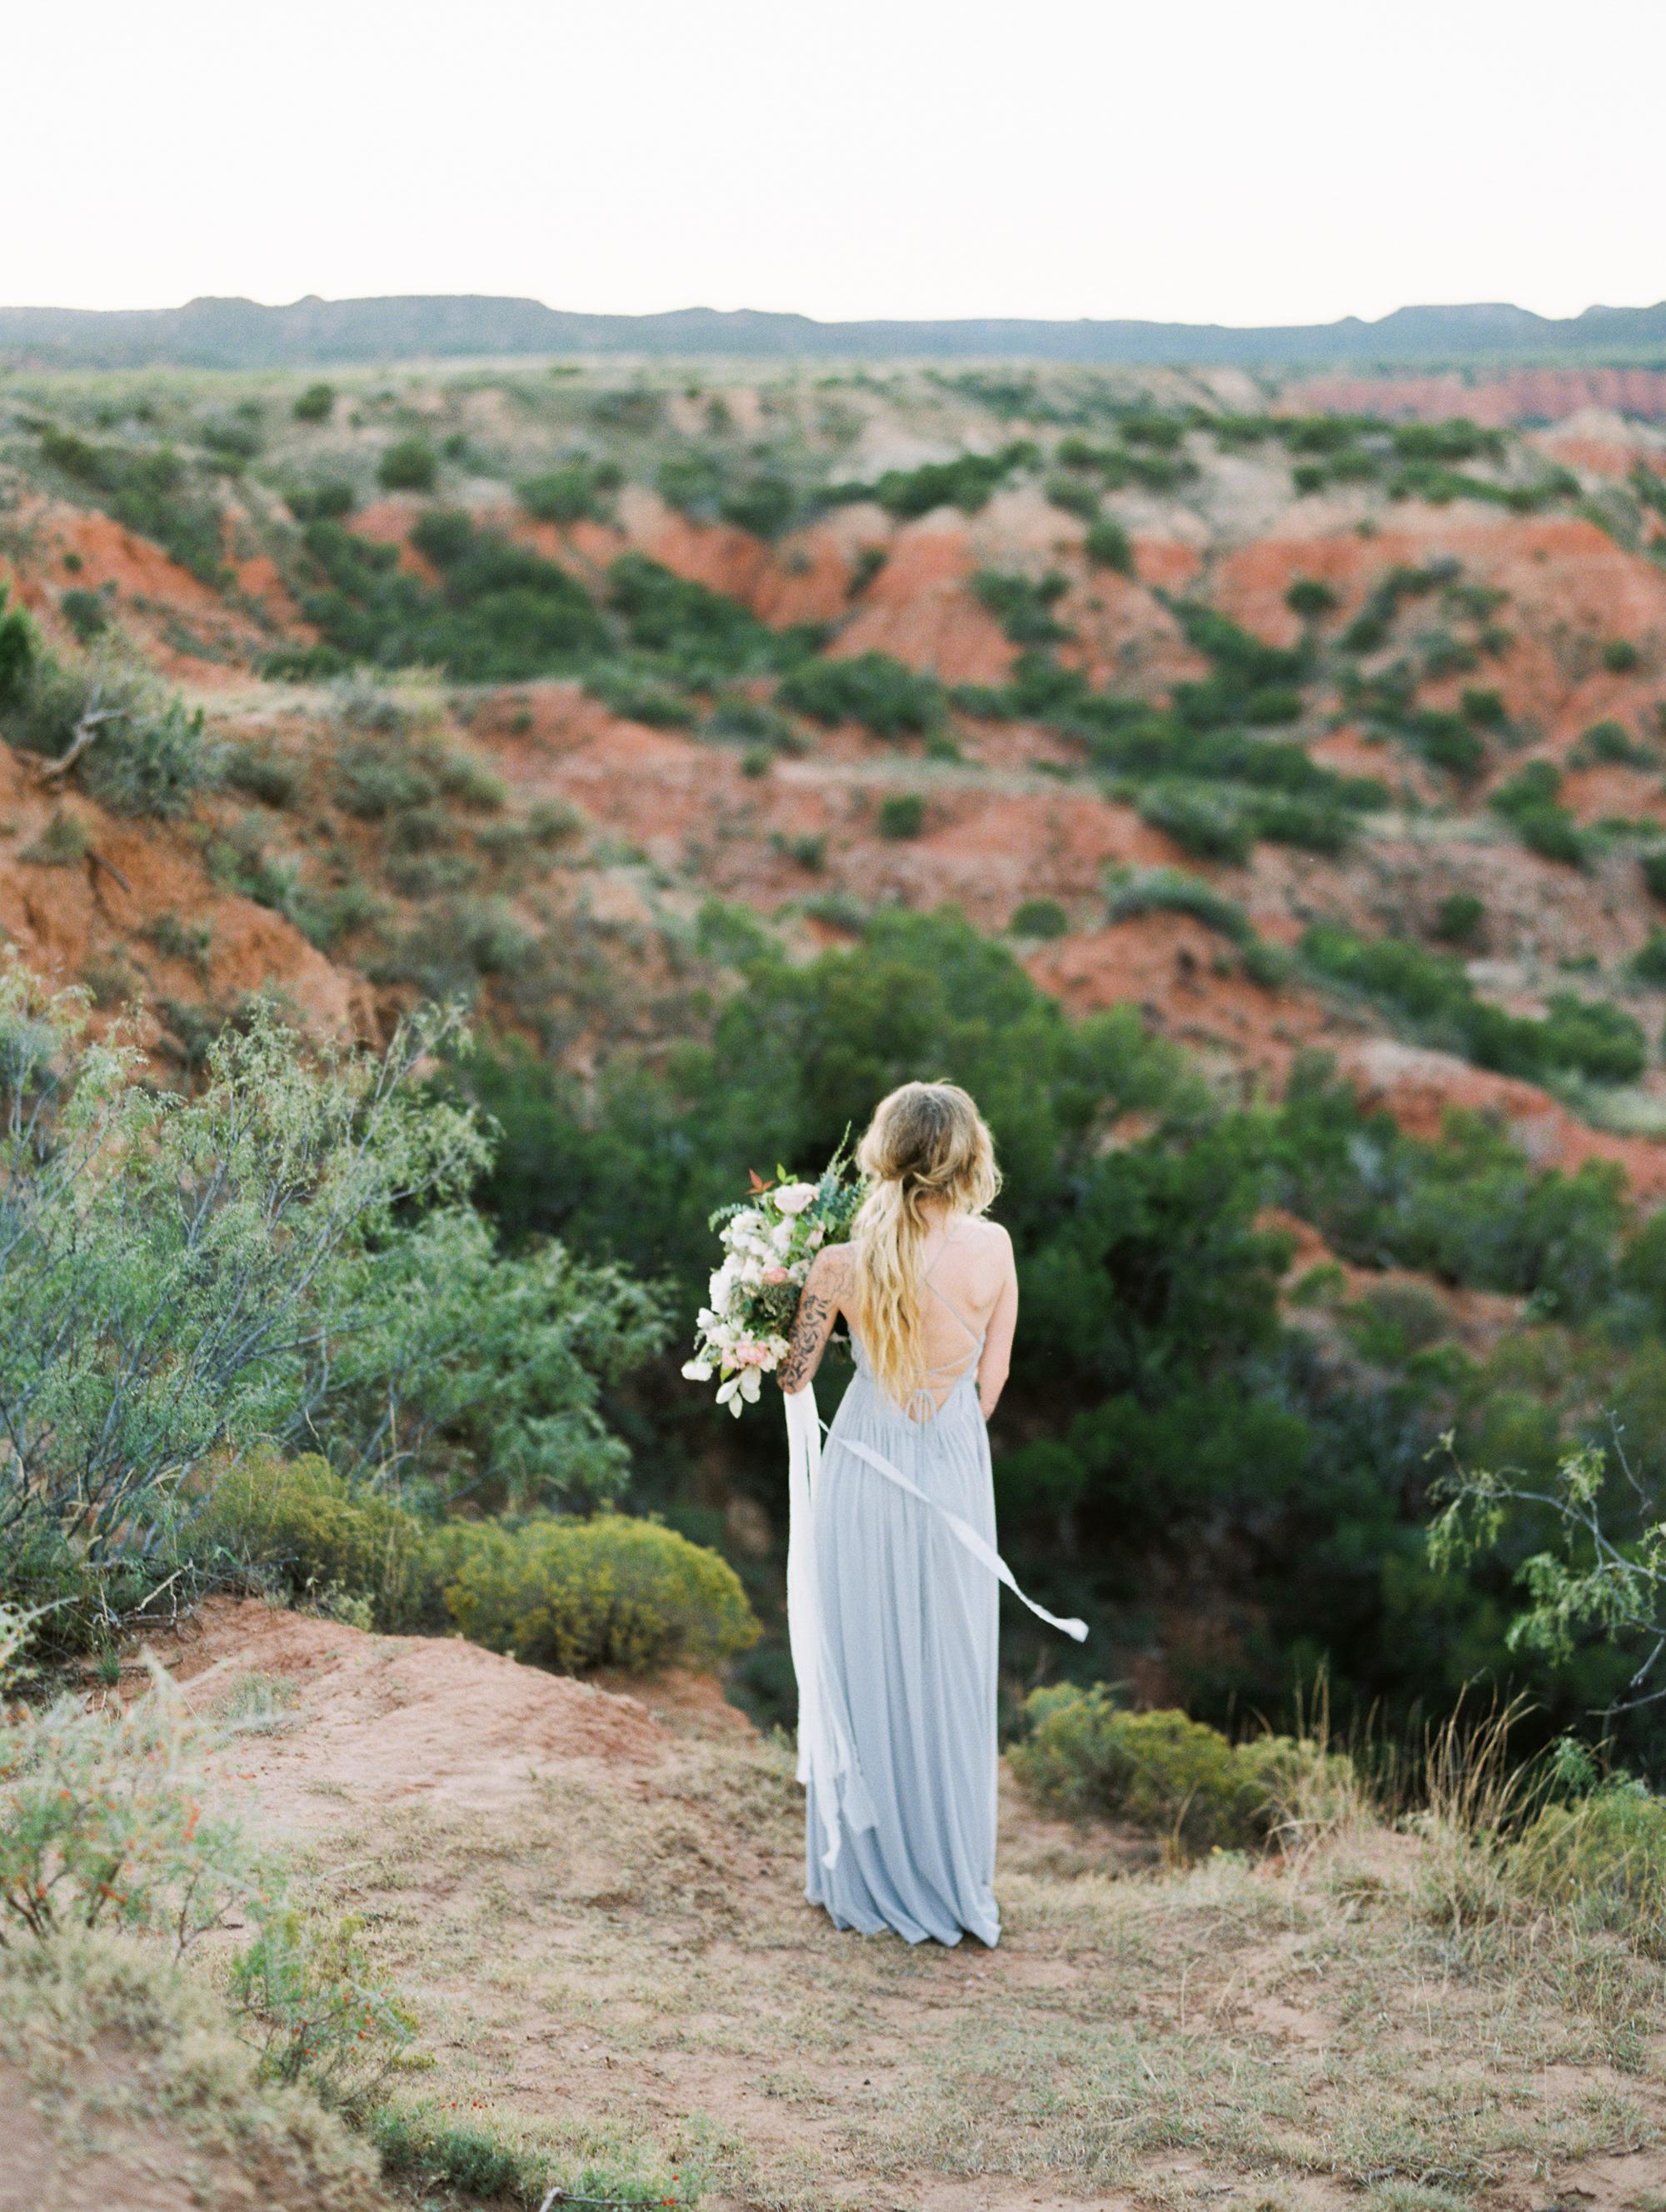 Katie-Rivera-Photography-Caprock-Canyon-Styled-Shoot-Candelaria-Designs-017.jpg